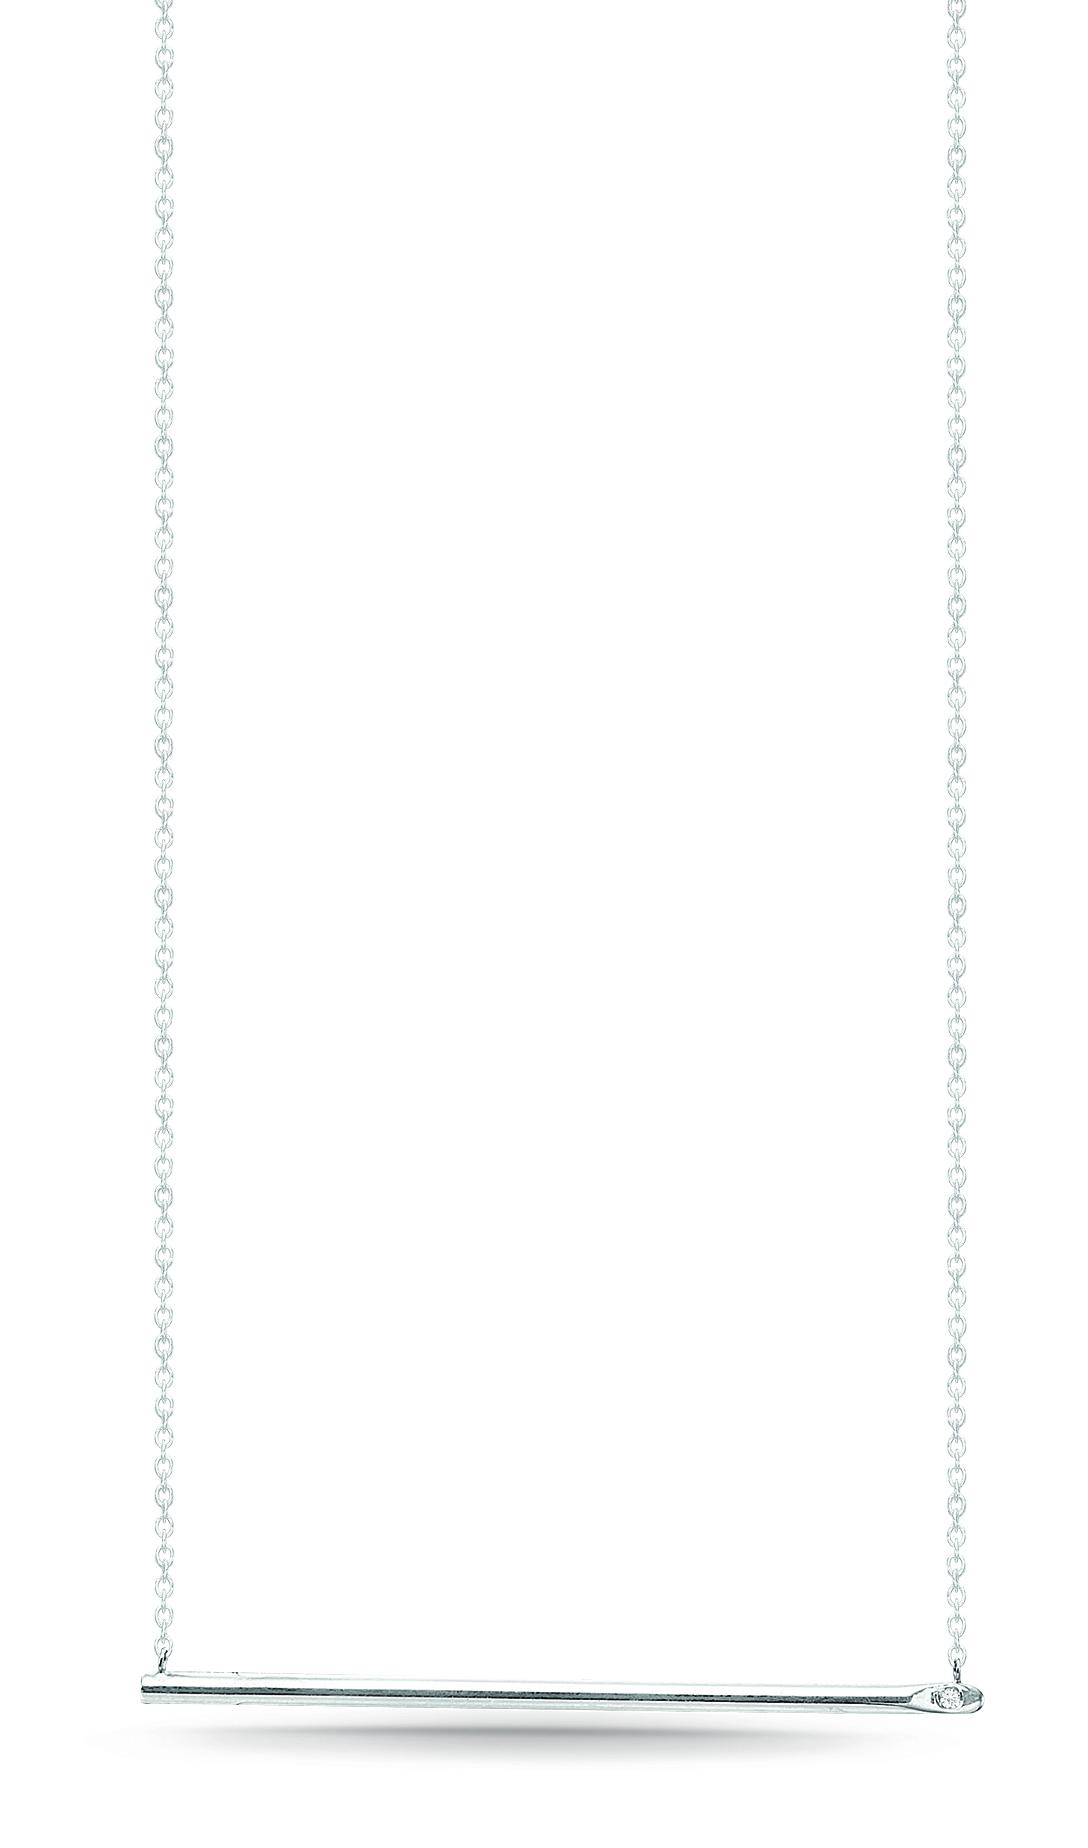 Image of   Kranz & Ziegler Sølv halssmykke - 6203584-45